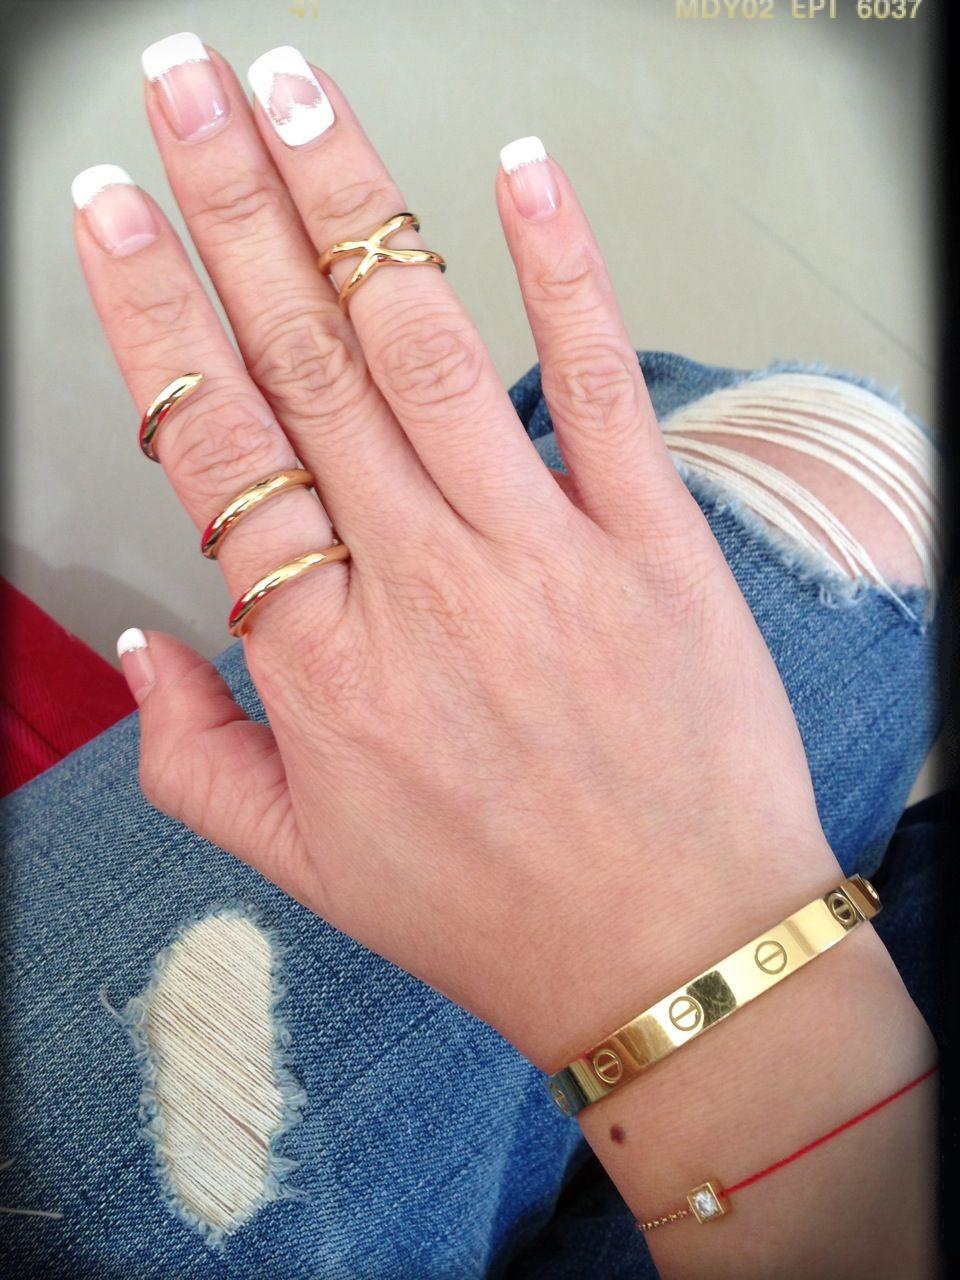 Nail ring, Cartier love and redline bracelet | My Style | Pinterest ...